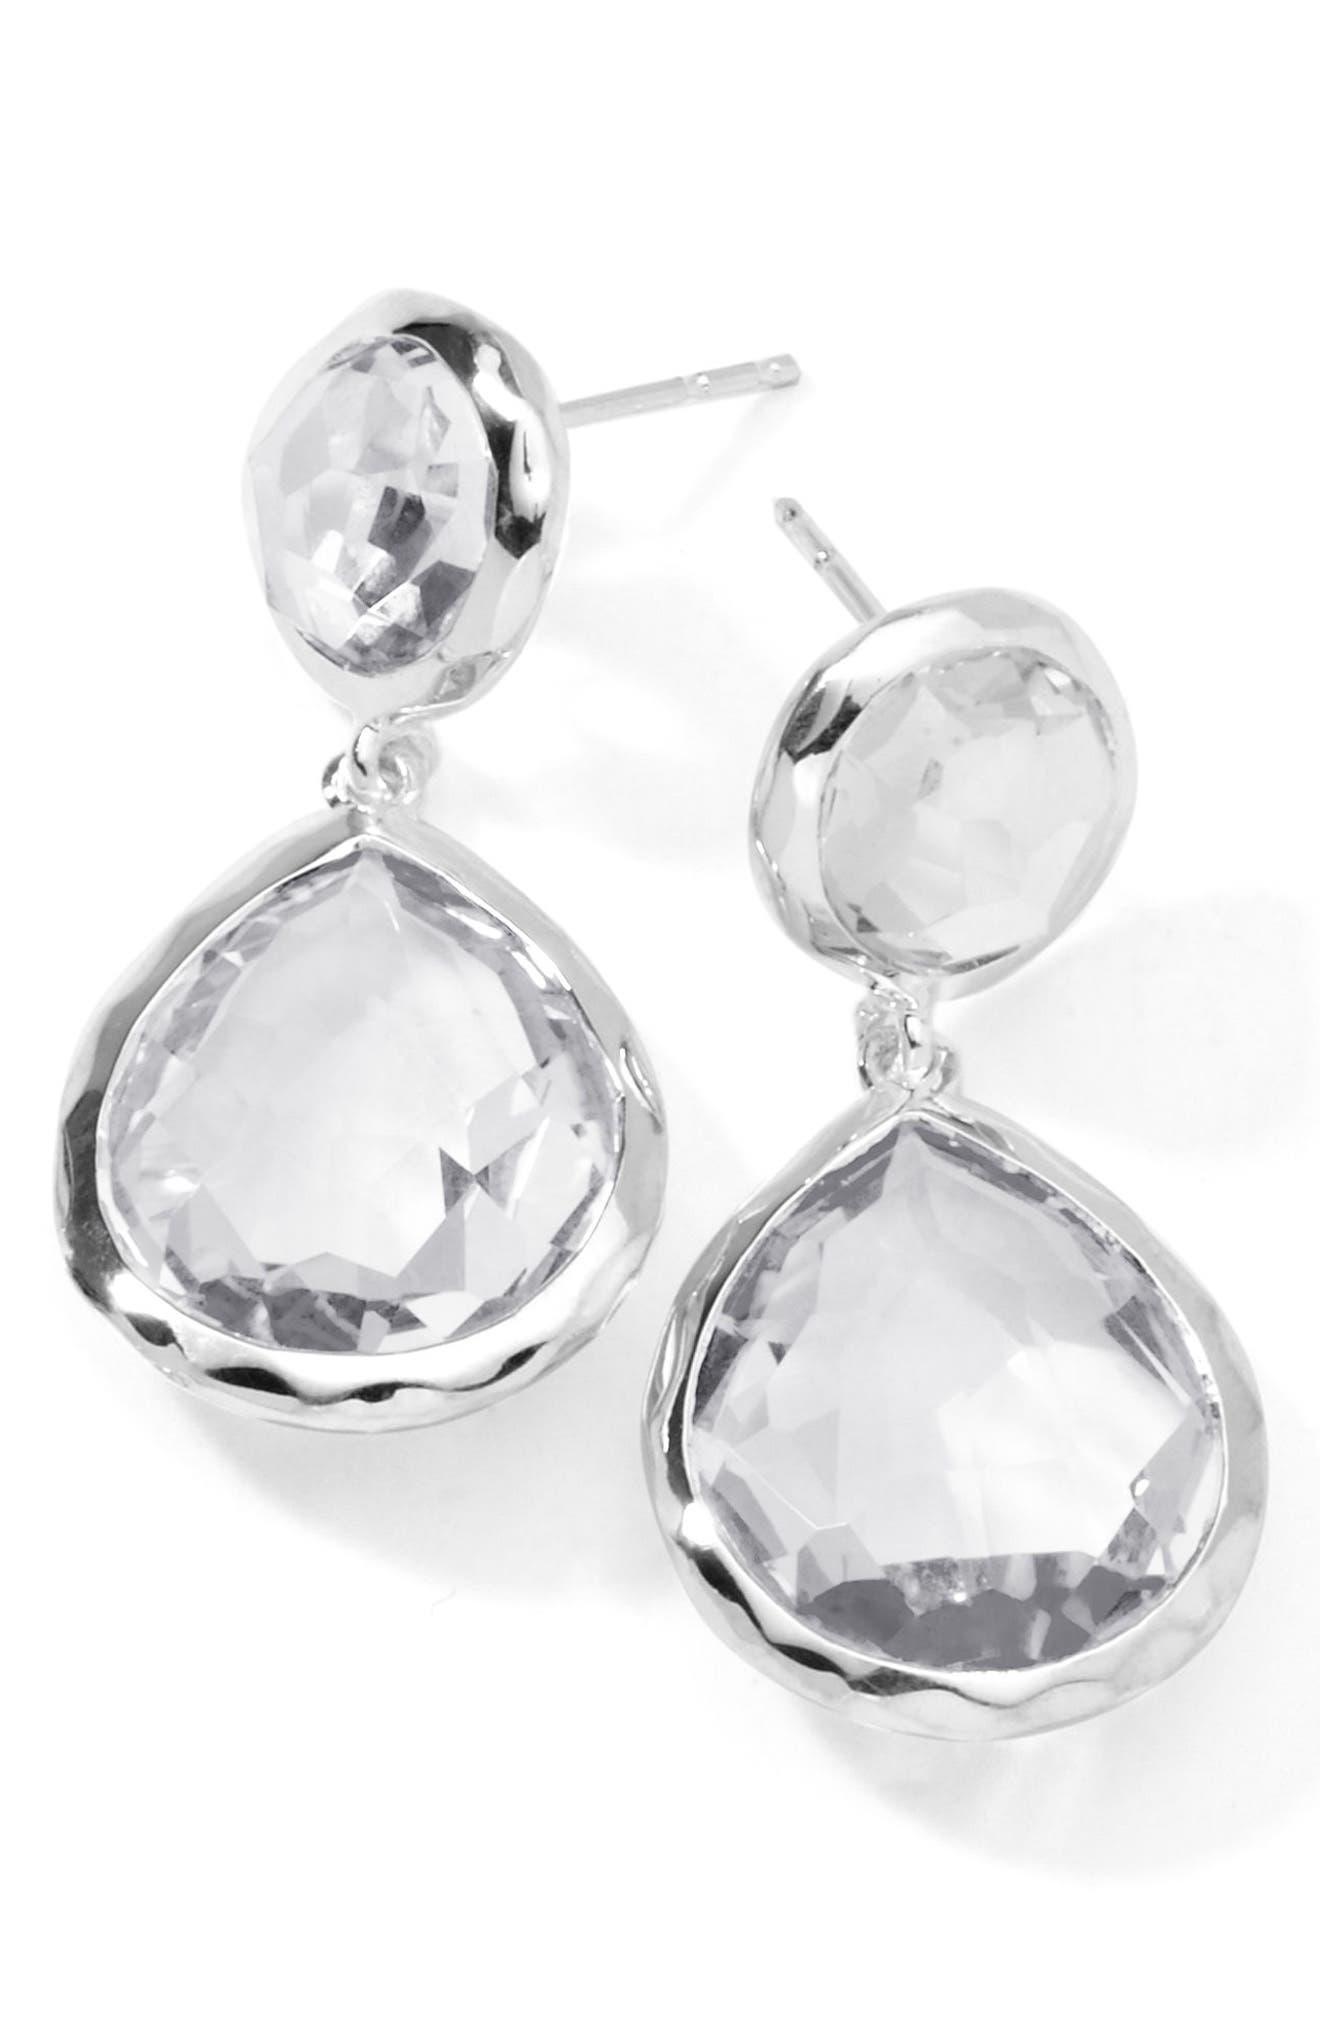 'Rock Candy - Snowman' Drop Earrings,                             Main thumbnail 1, color,                             Silver/Clear Quartz